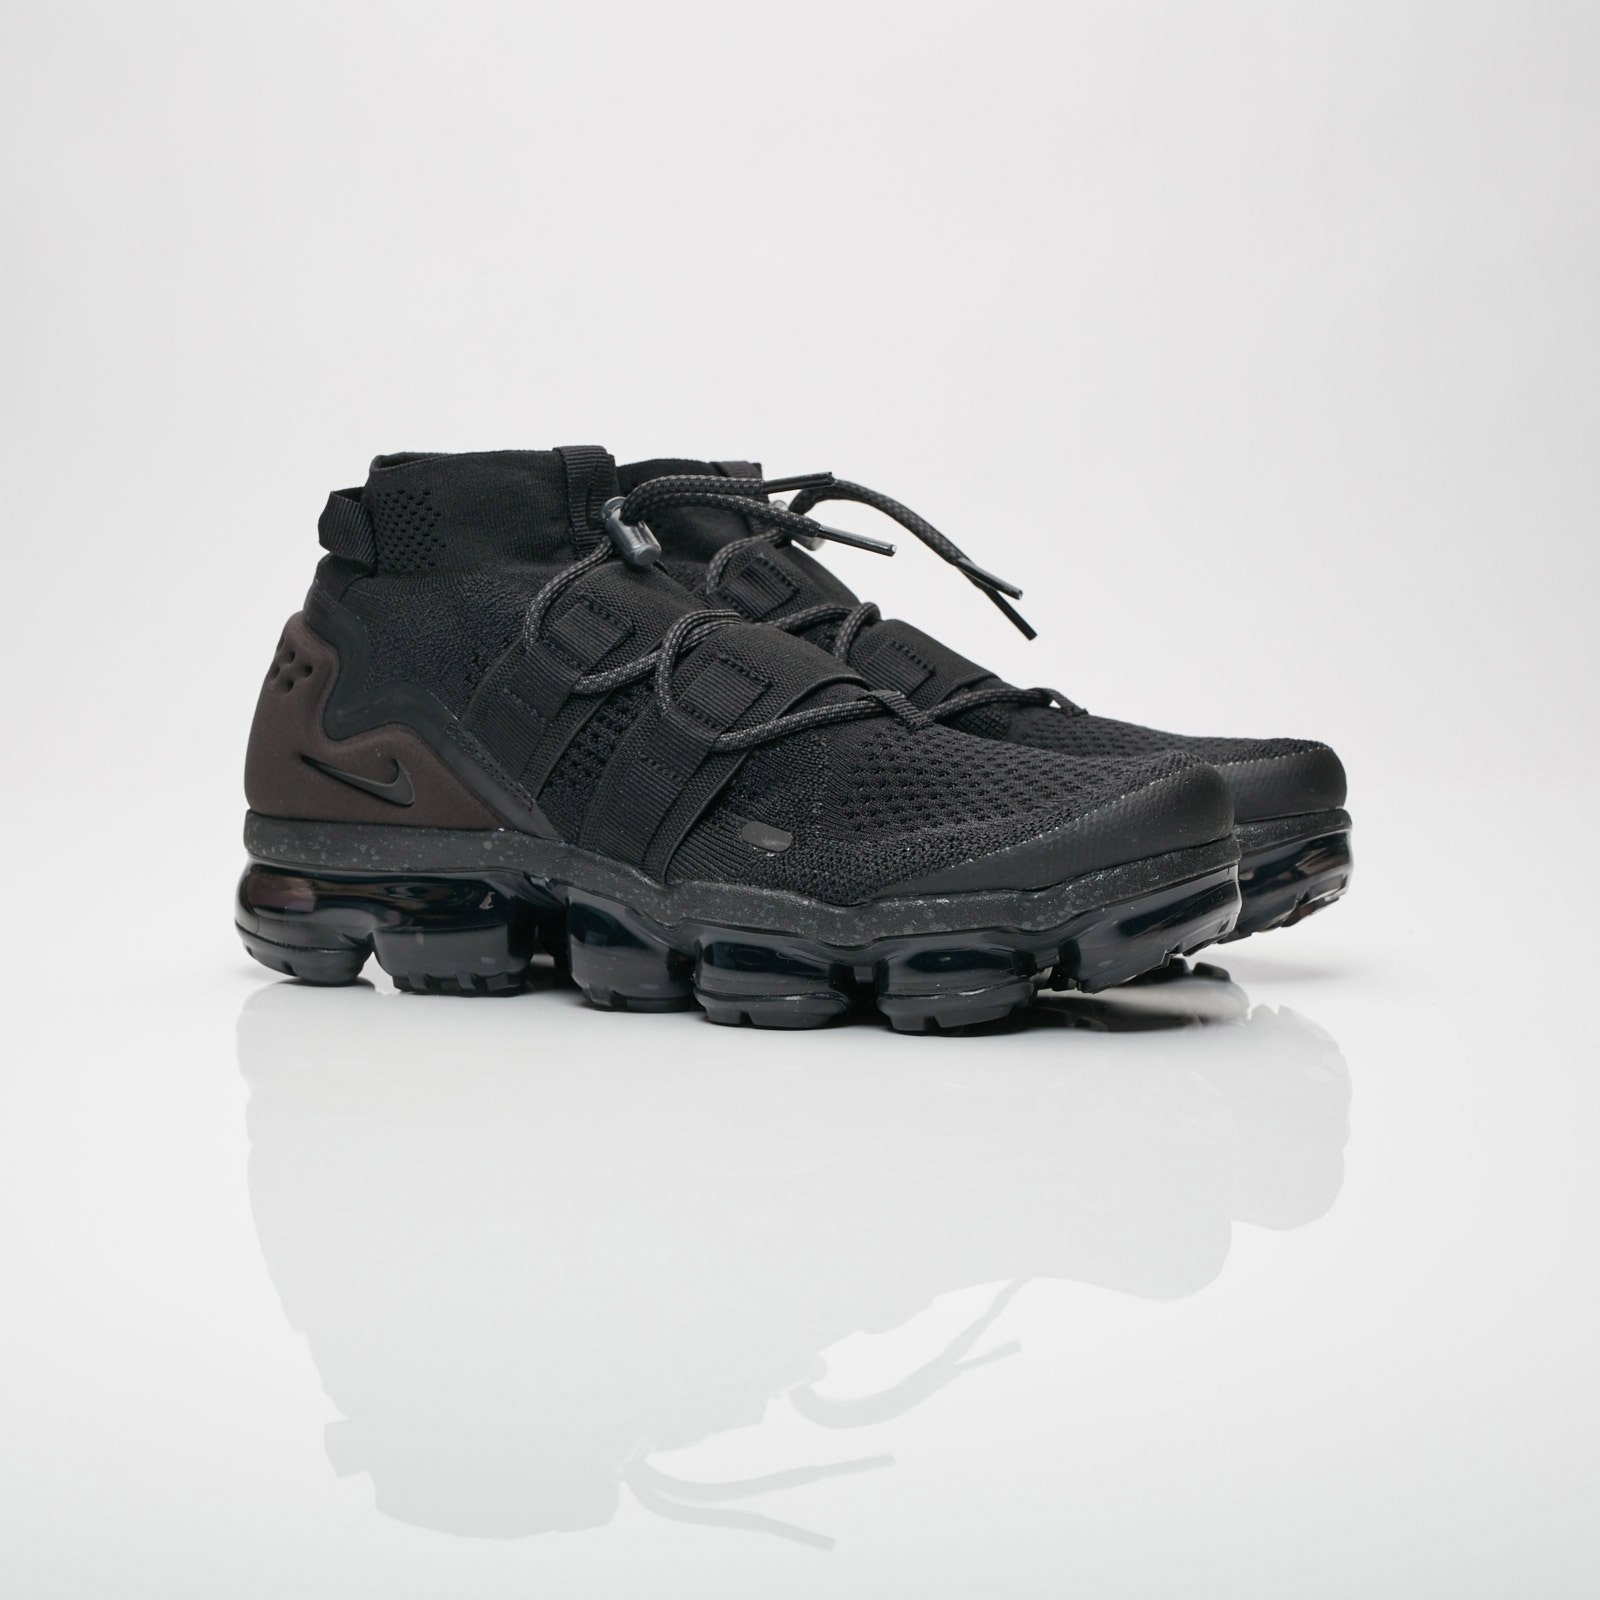 958c0ebde98 Nike Air Vapormax FK Utility - Ah6834-001 - Sneakersnstuff ...